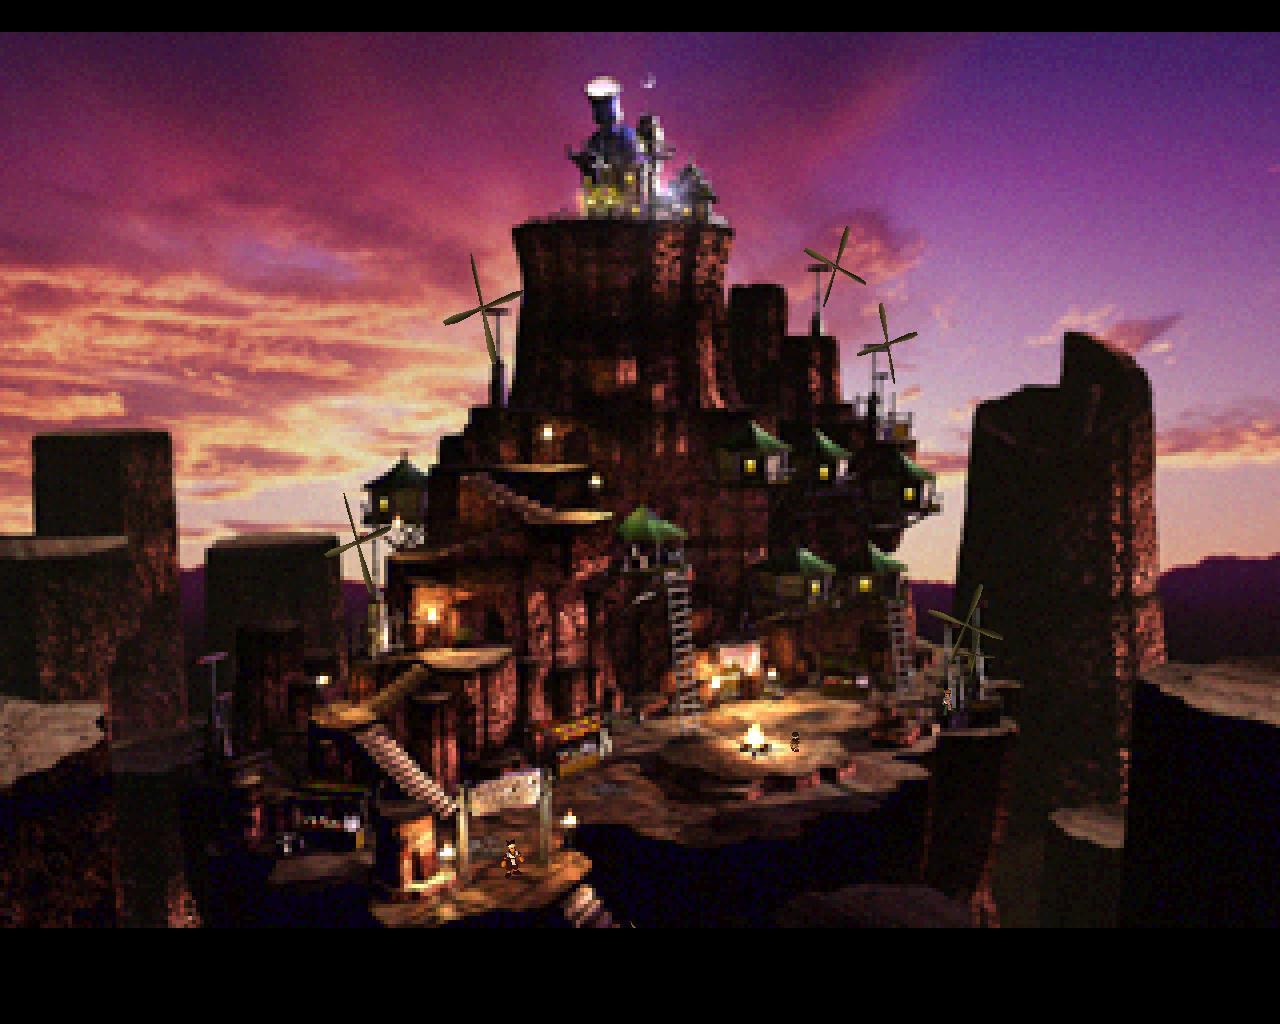 Final Fantasy VII Screenshot 1 Cosmo Canyon.jpg